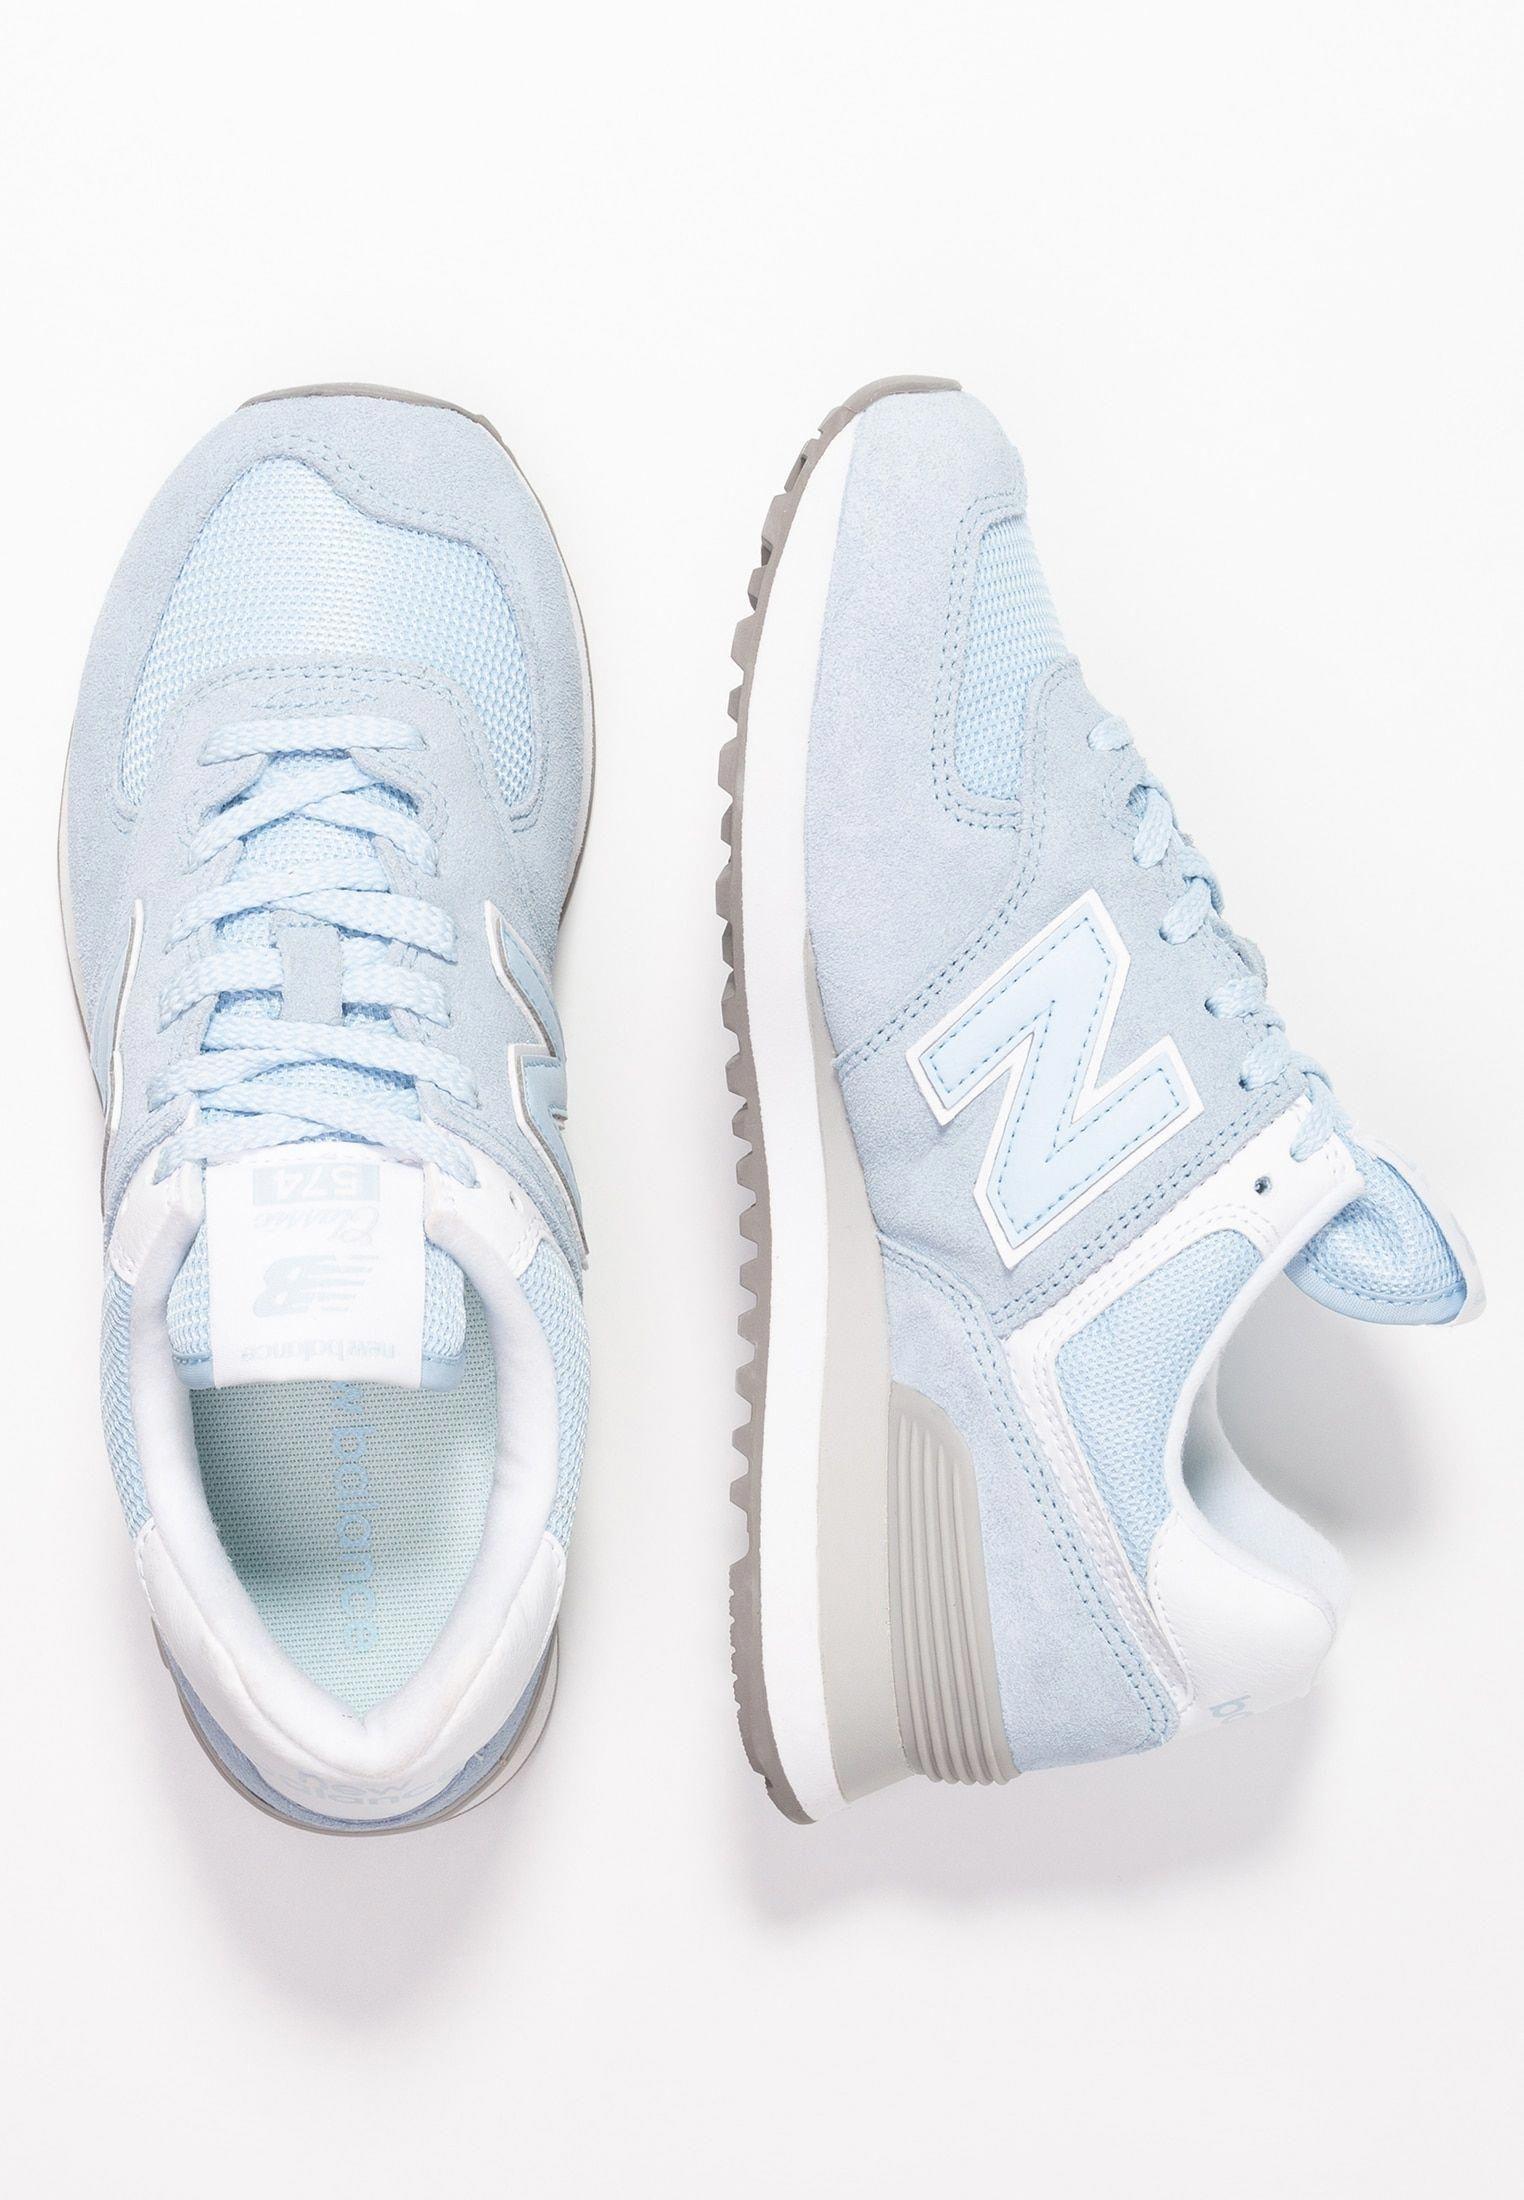 Tennis Shoe Wedges For Women #shoesaholic #TennisShoes